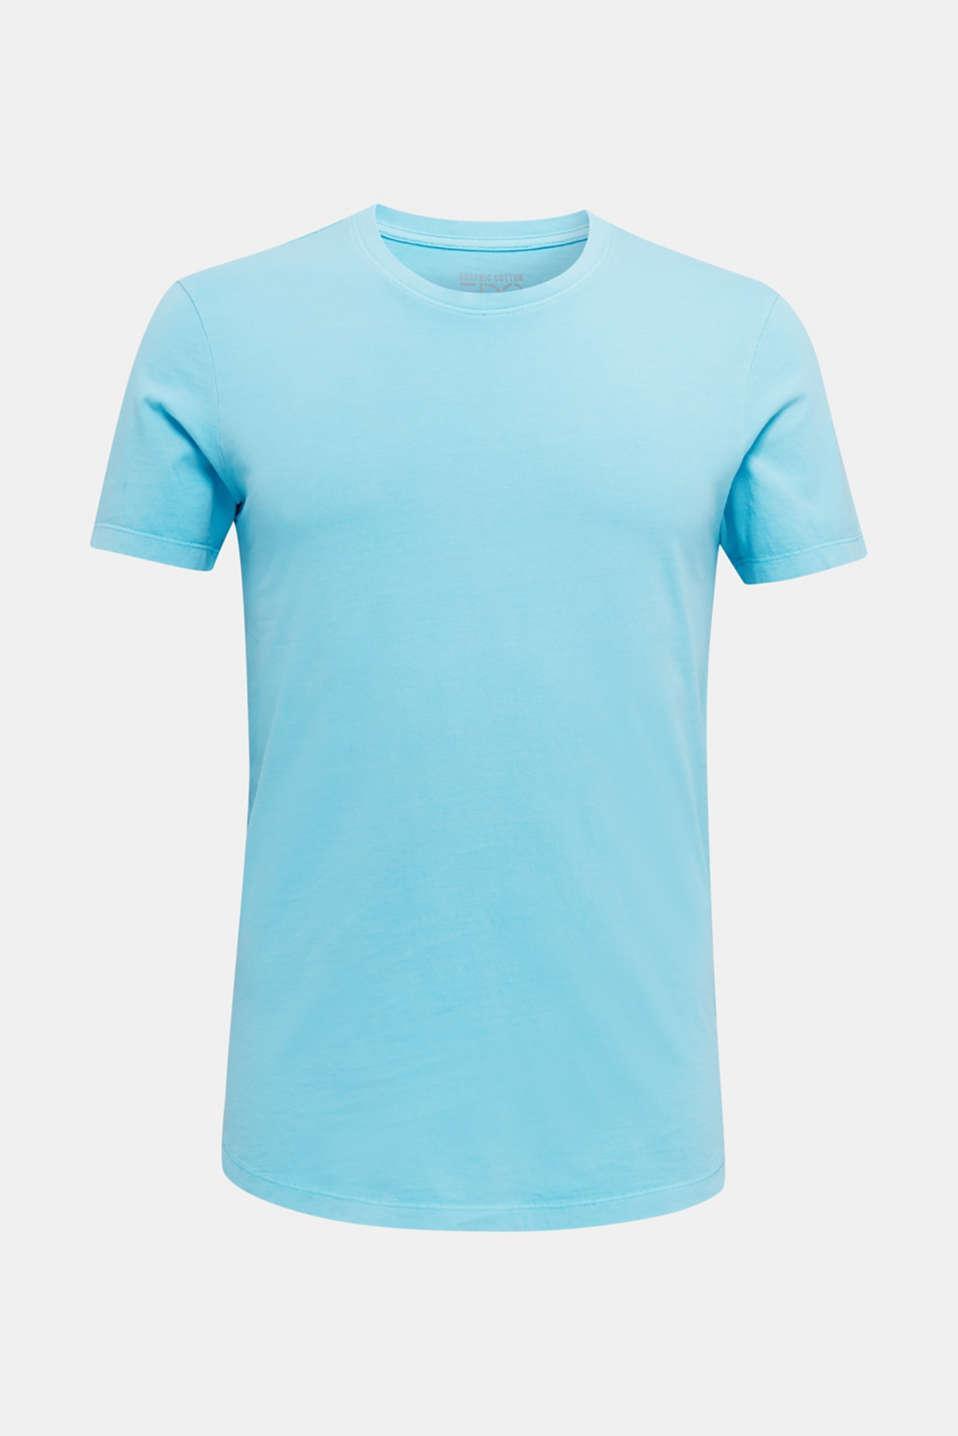 Jersey top, 100% organic cotton, LIGHT BLUE 2, detail image number 7